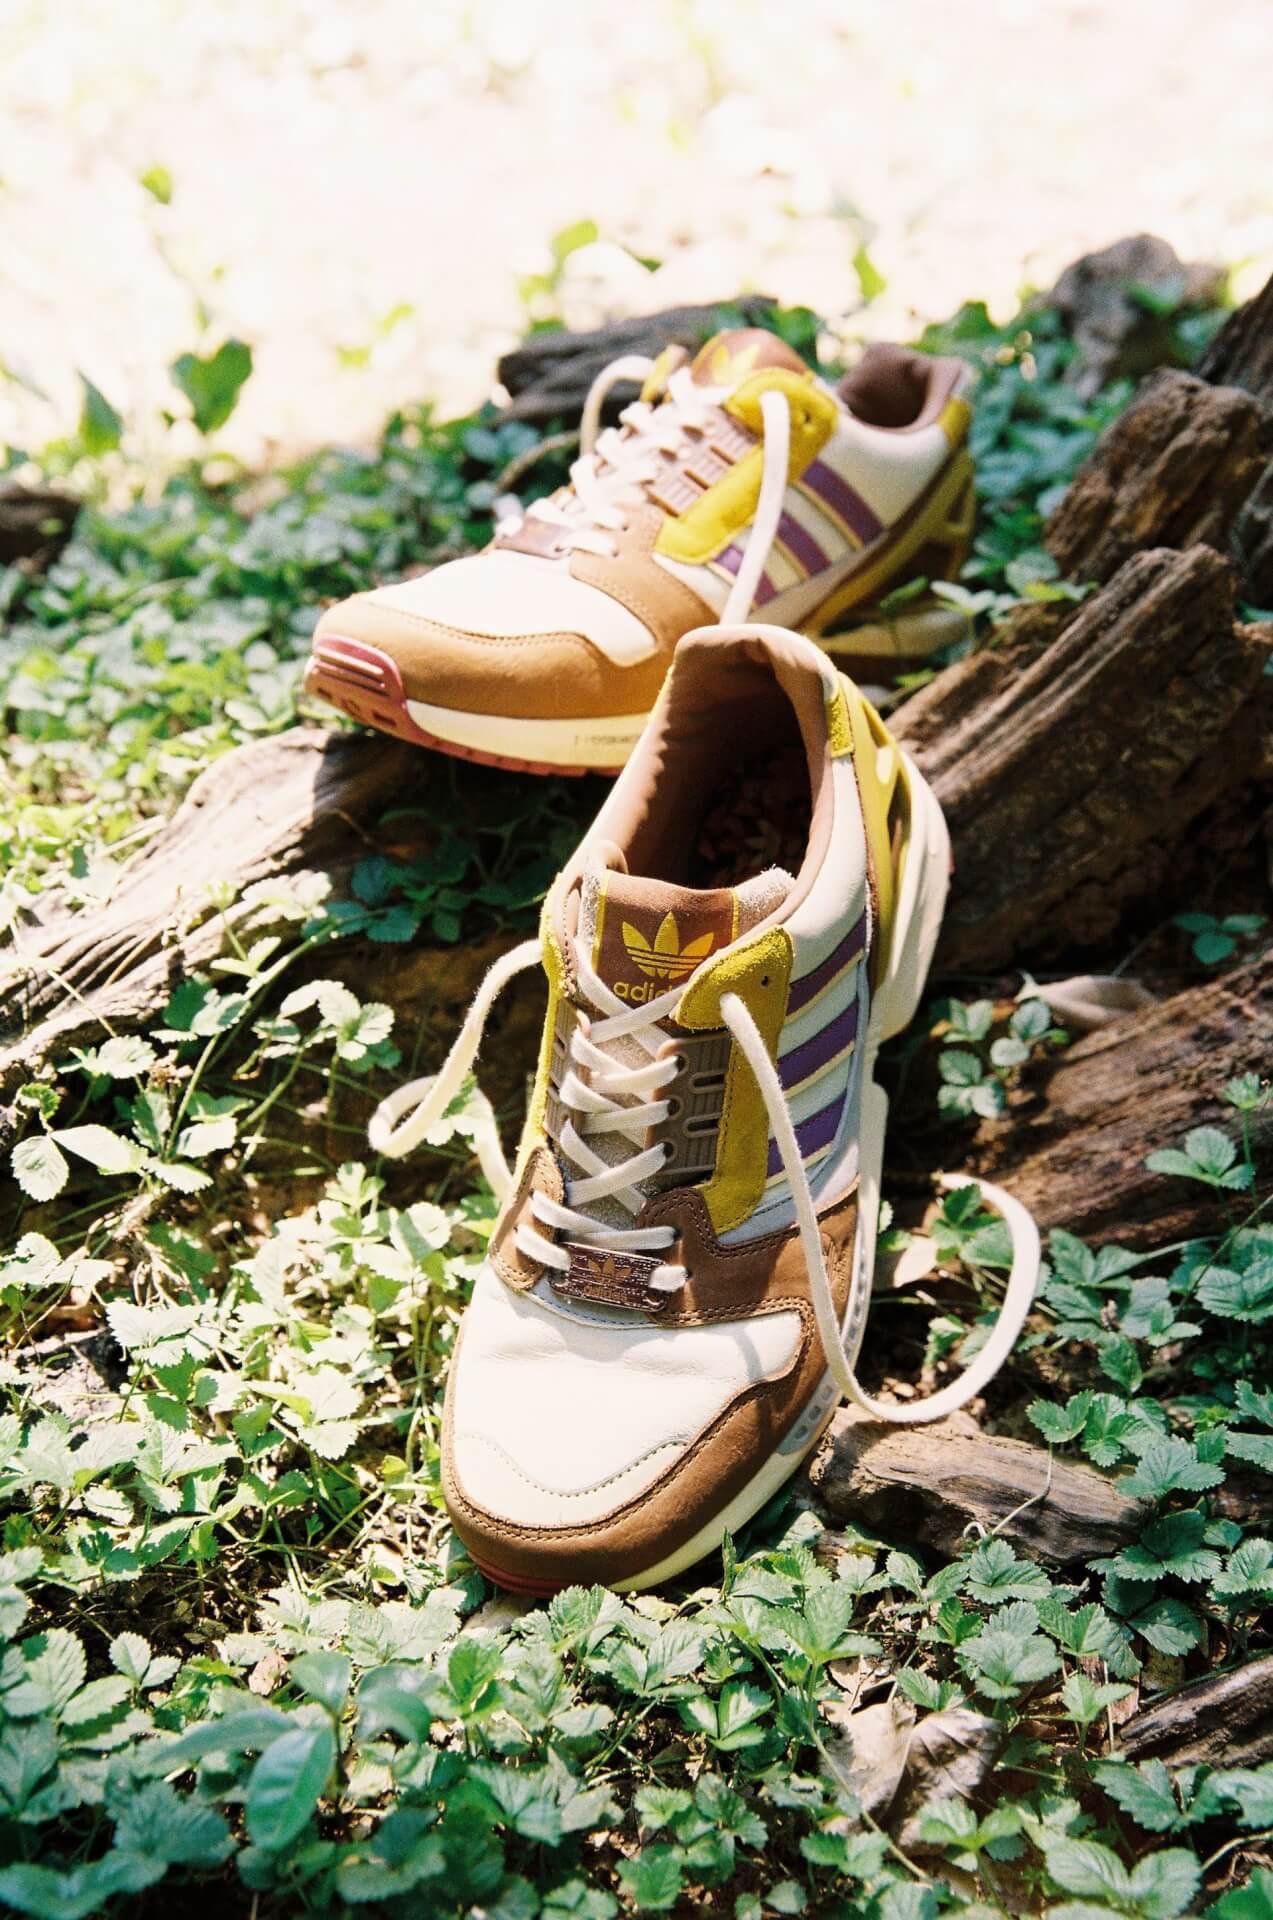 "adidas Originalsとatmosのコラボパック「""YOYOGI PARK"" PACK」が登場!代々木公園をモチーフにしたZX 8000、FORUMの2足が発売 life210802_adidasoriginals_yoyogipark_7"